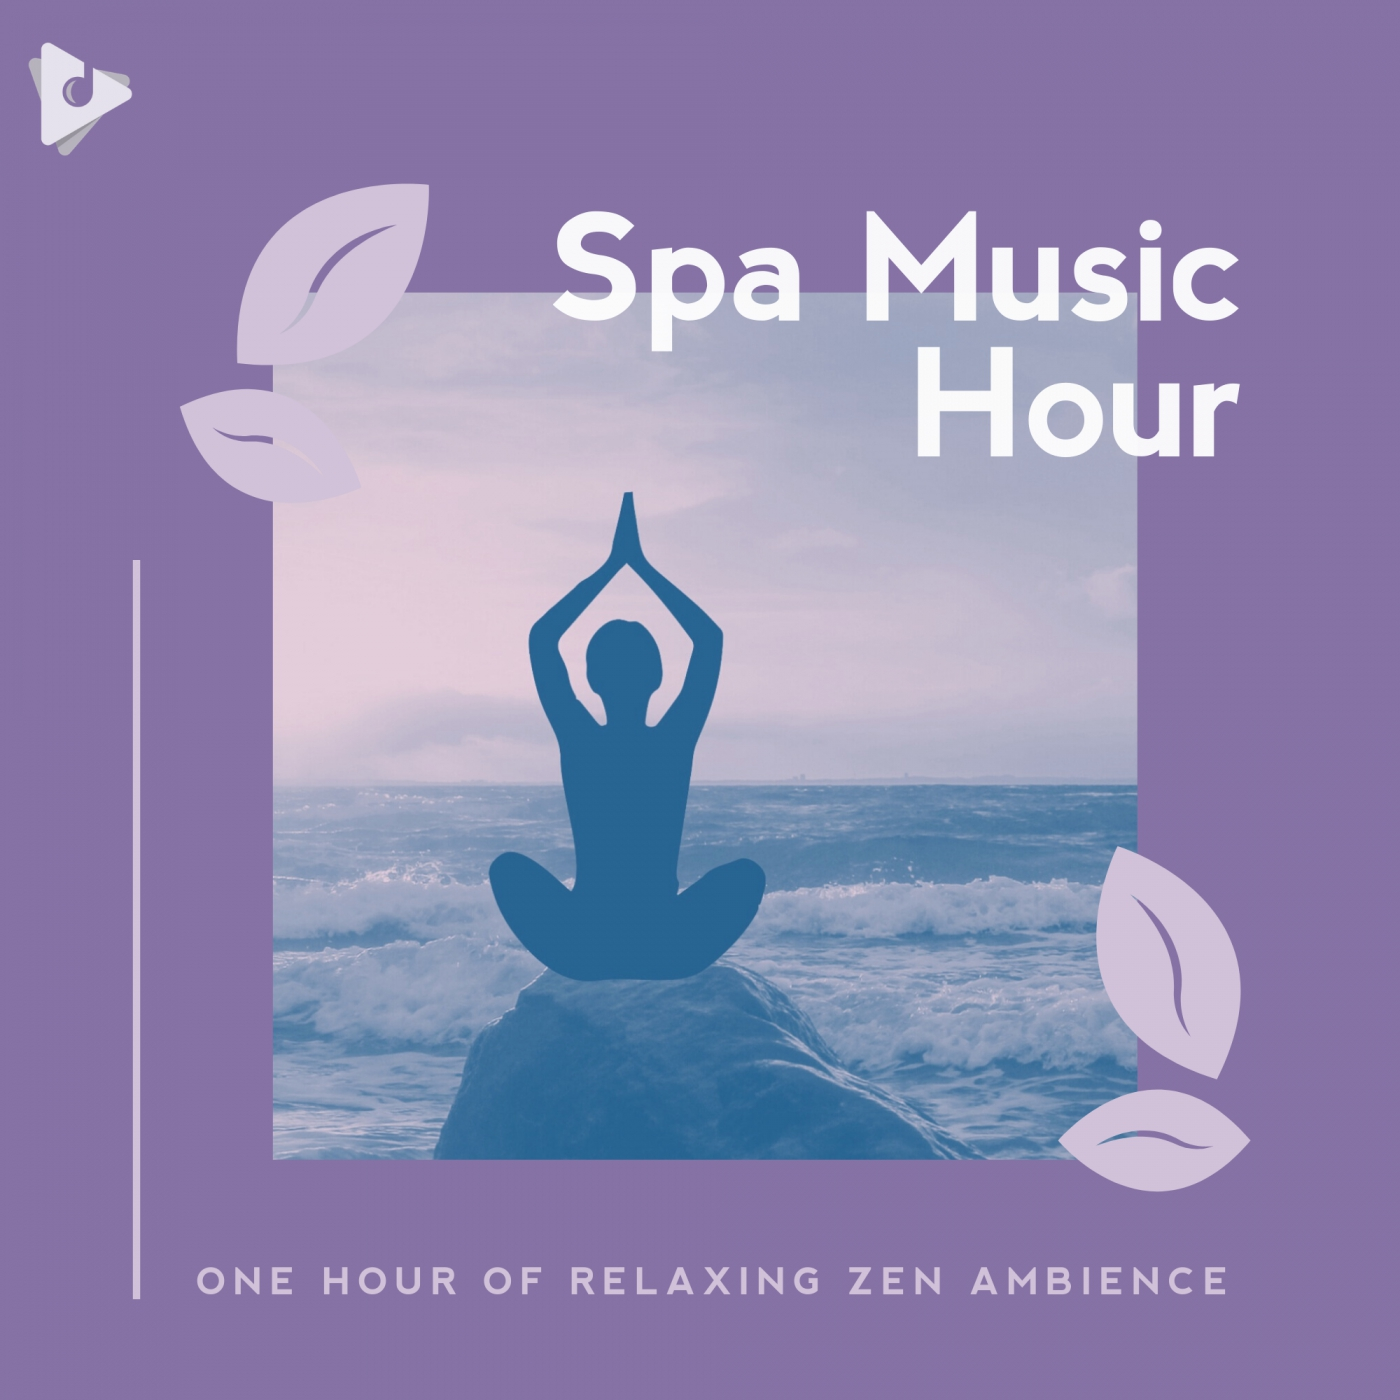 One Hour of Relaxing Zen Ambience